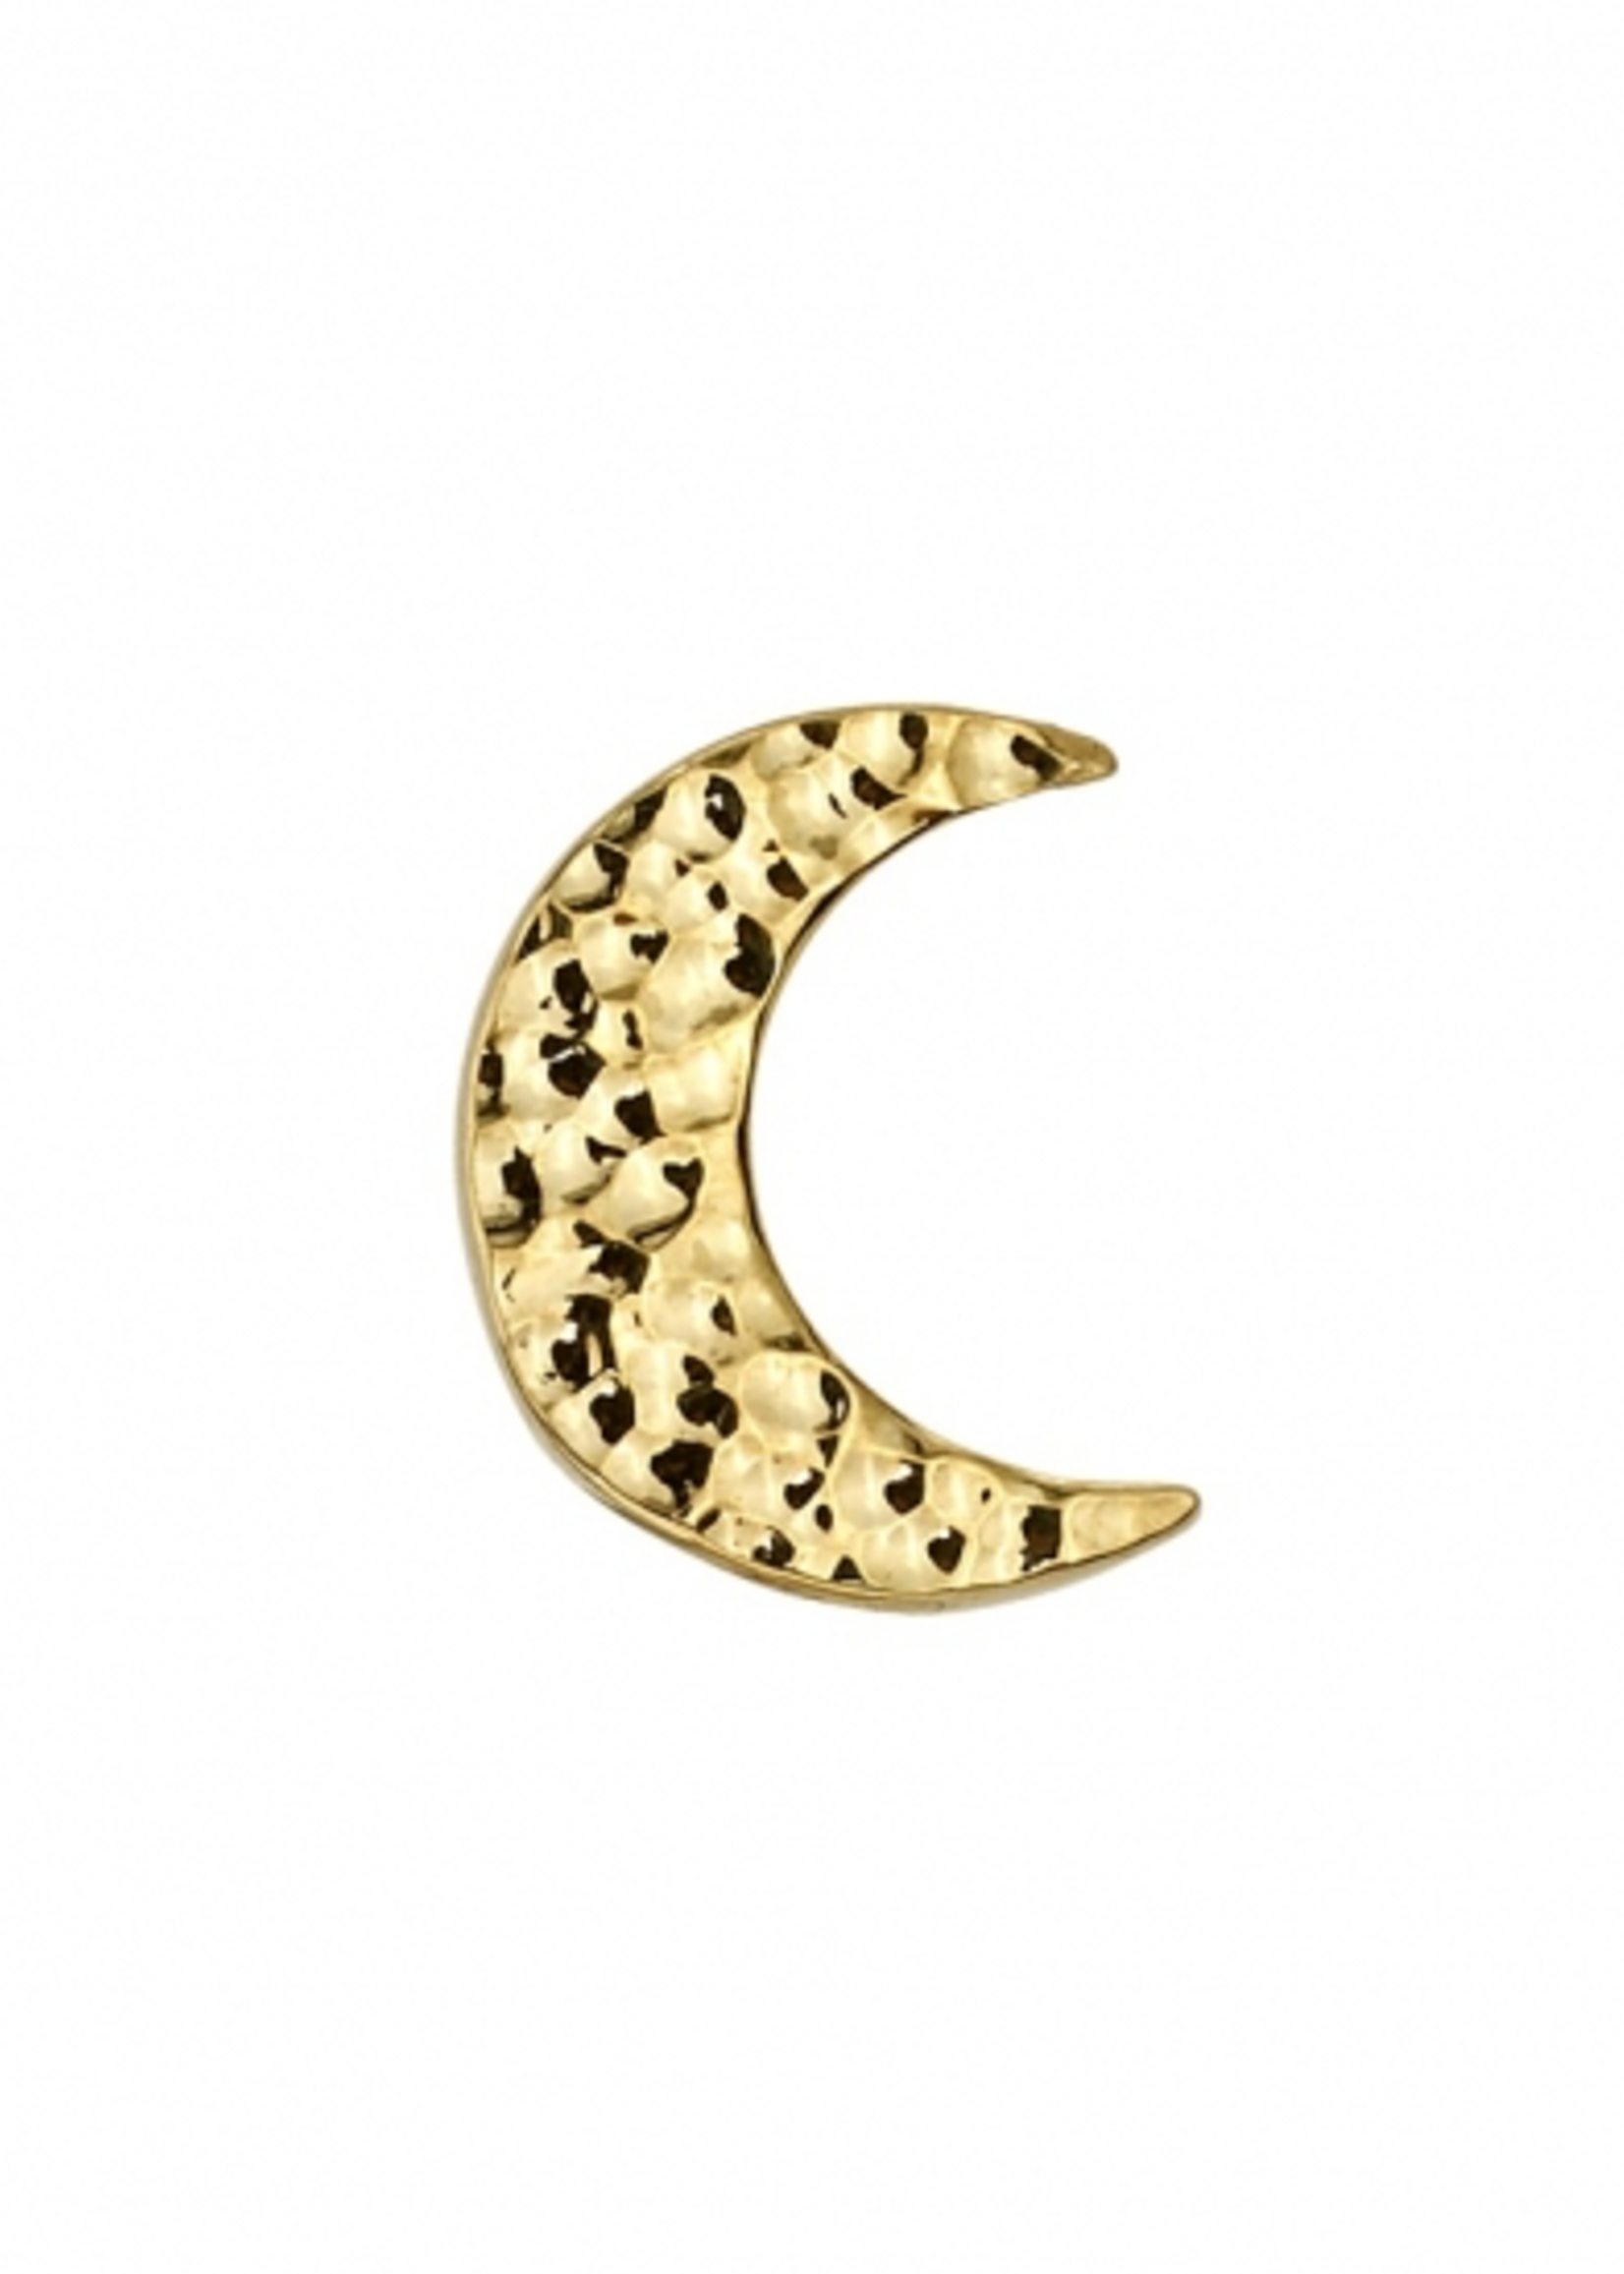 14k YG Hammered Crescent Moon